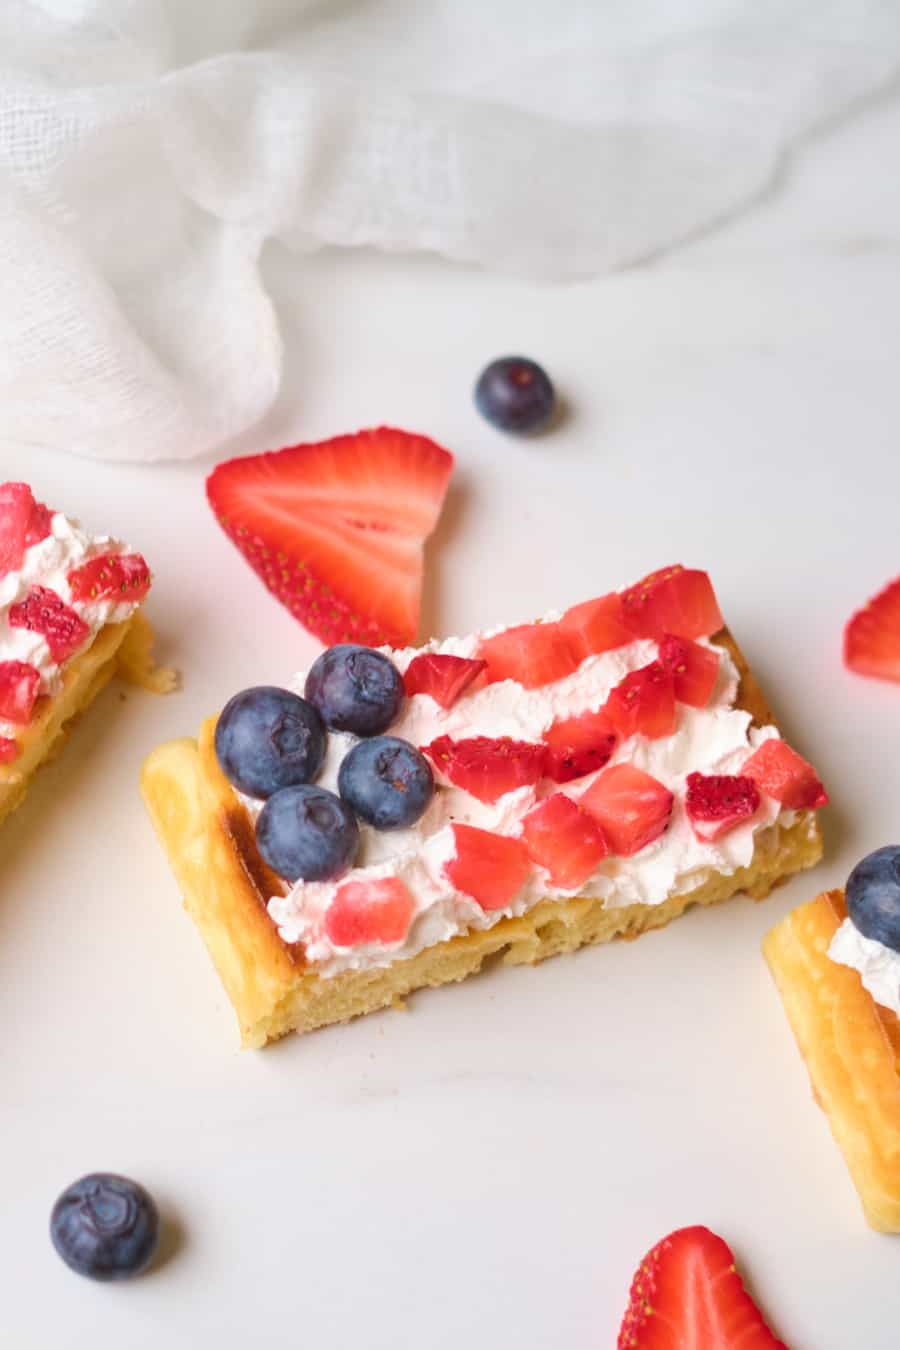 Patriotic Flag Waffles 4th of July Treat